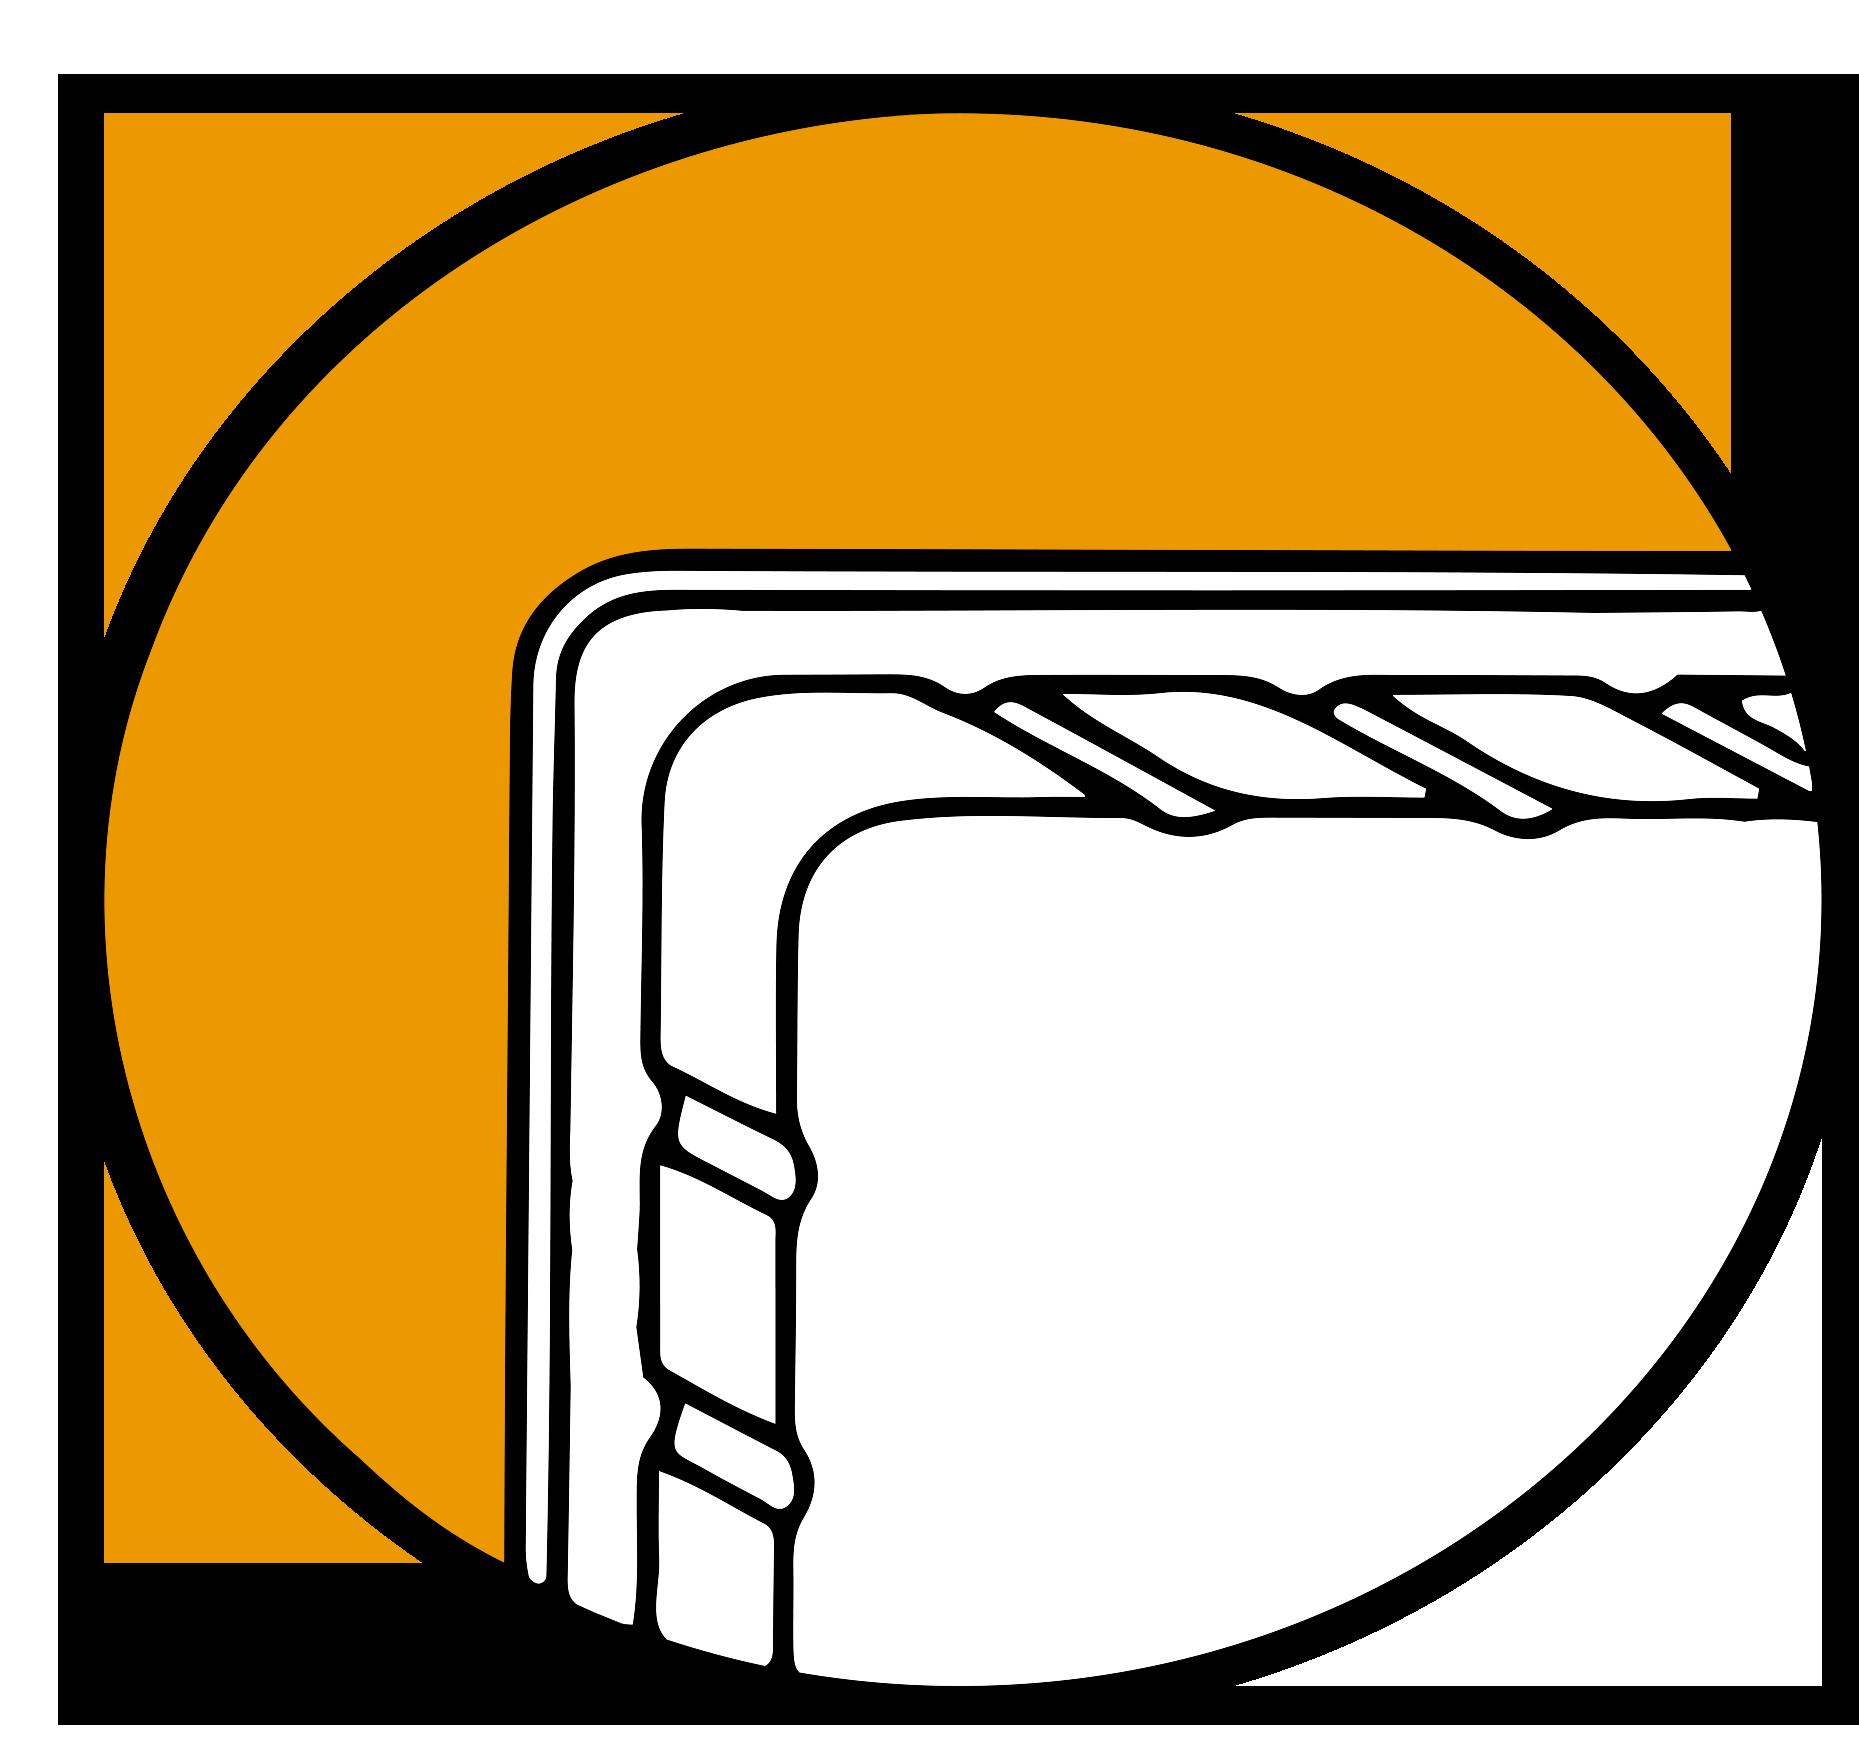 multimedia-packaging-overlap interlockribbed-spineribbed-sidewalls